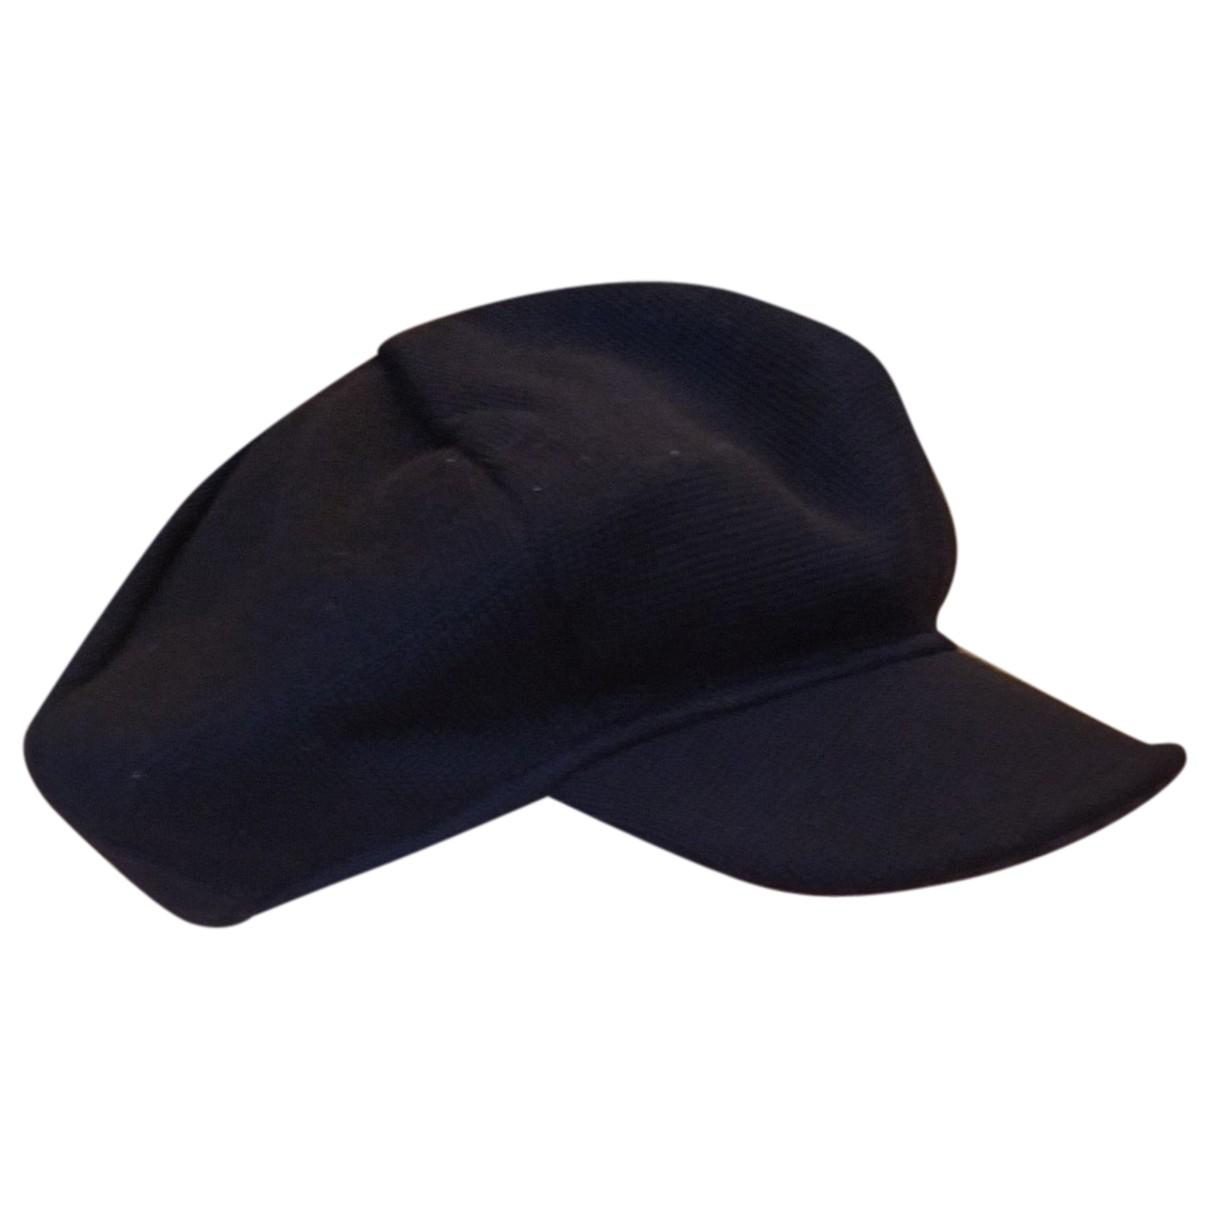 Fendi N Black Wool hat for Women M International